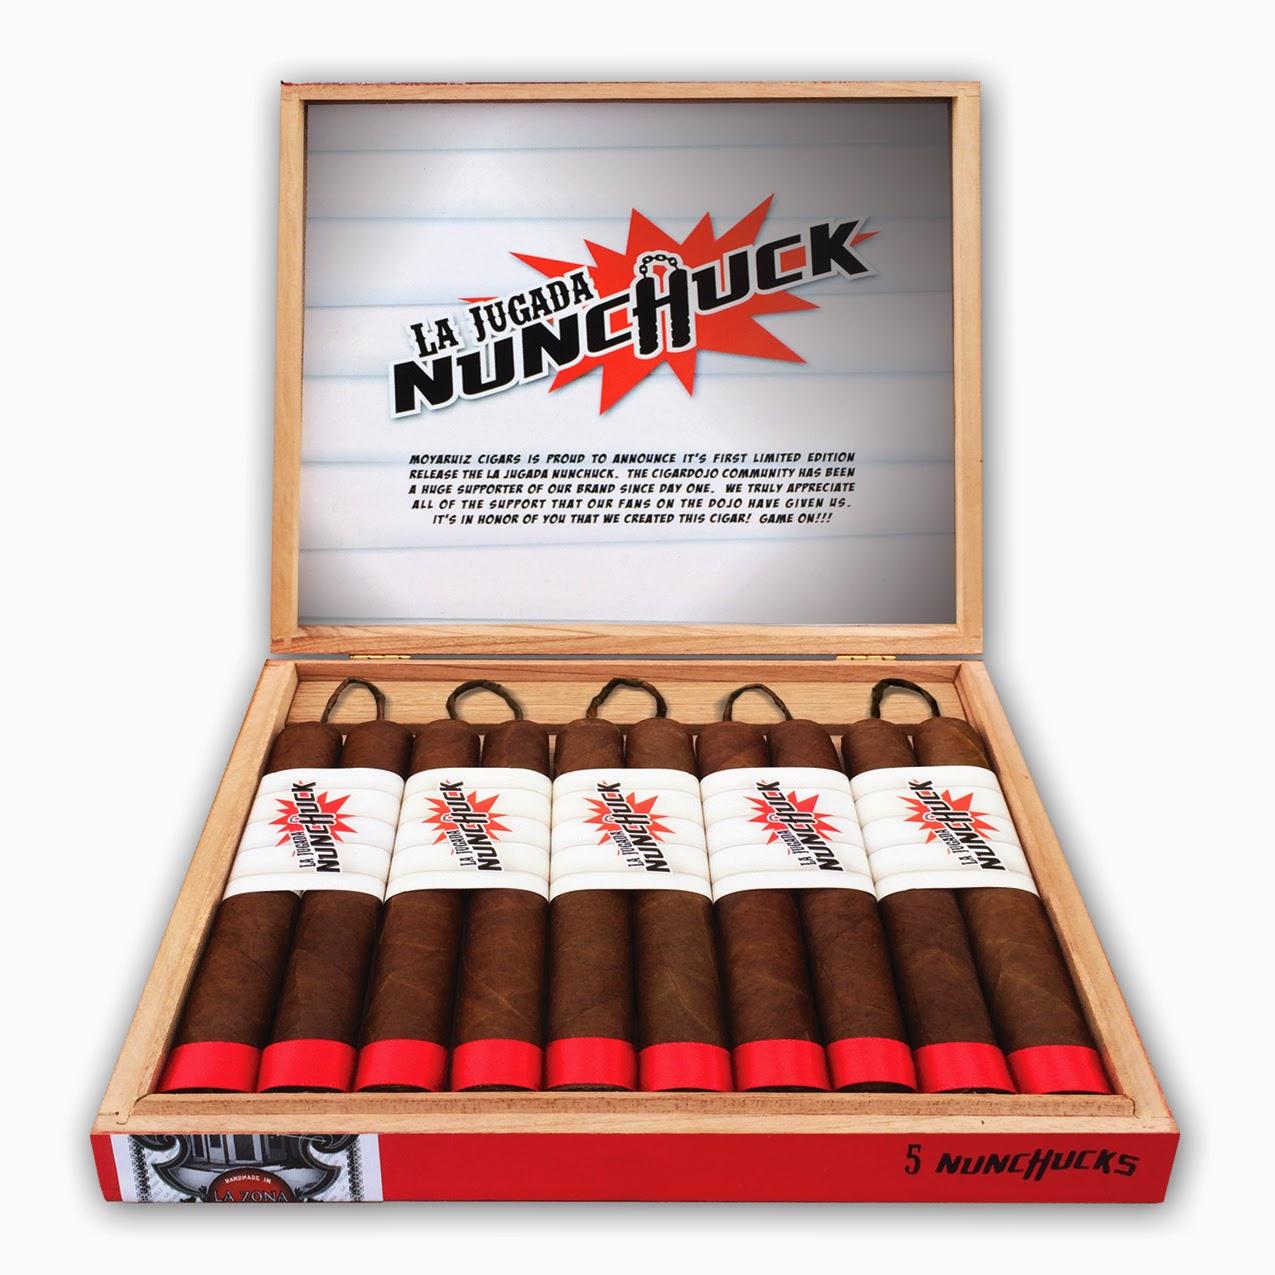 Cigar News: Moya Ruiz Cigars Officially Announces La Jugada Nunchuck (Cigar Preview)